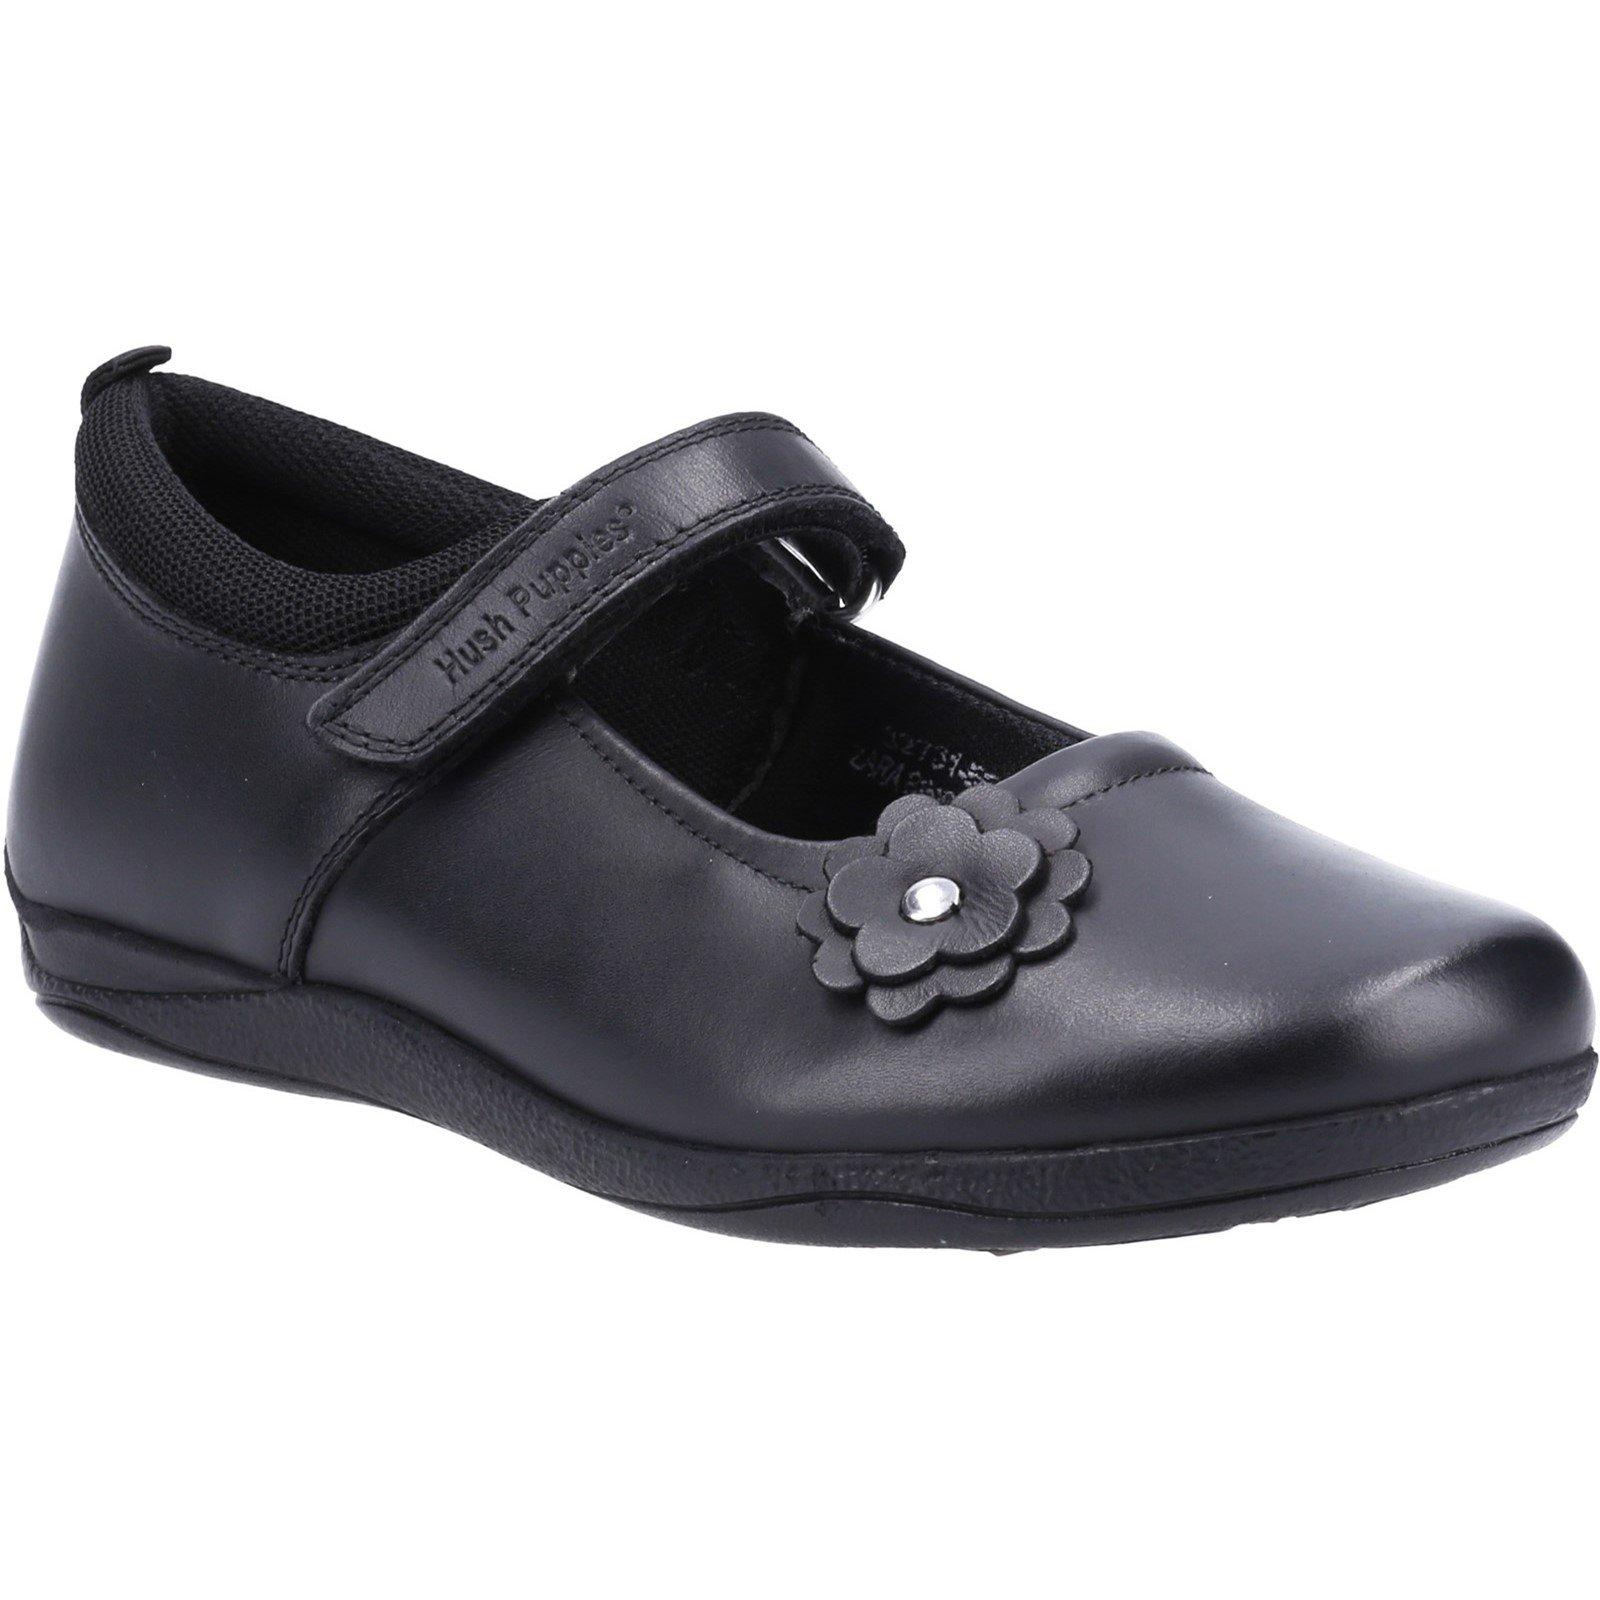 Hush Puppies Kid's Zara Junior School Flat Shoe Black 32731 - Black 2